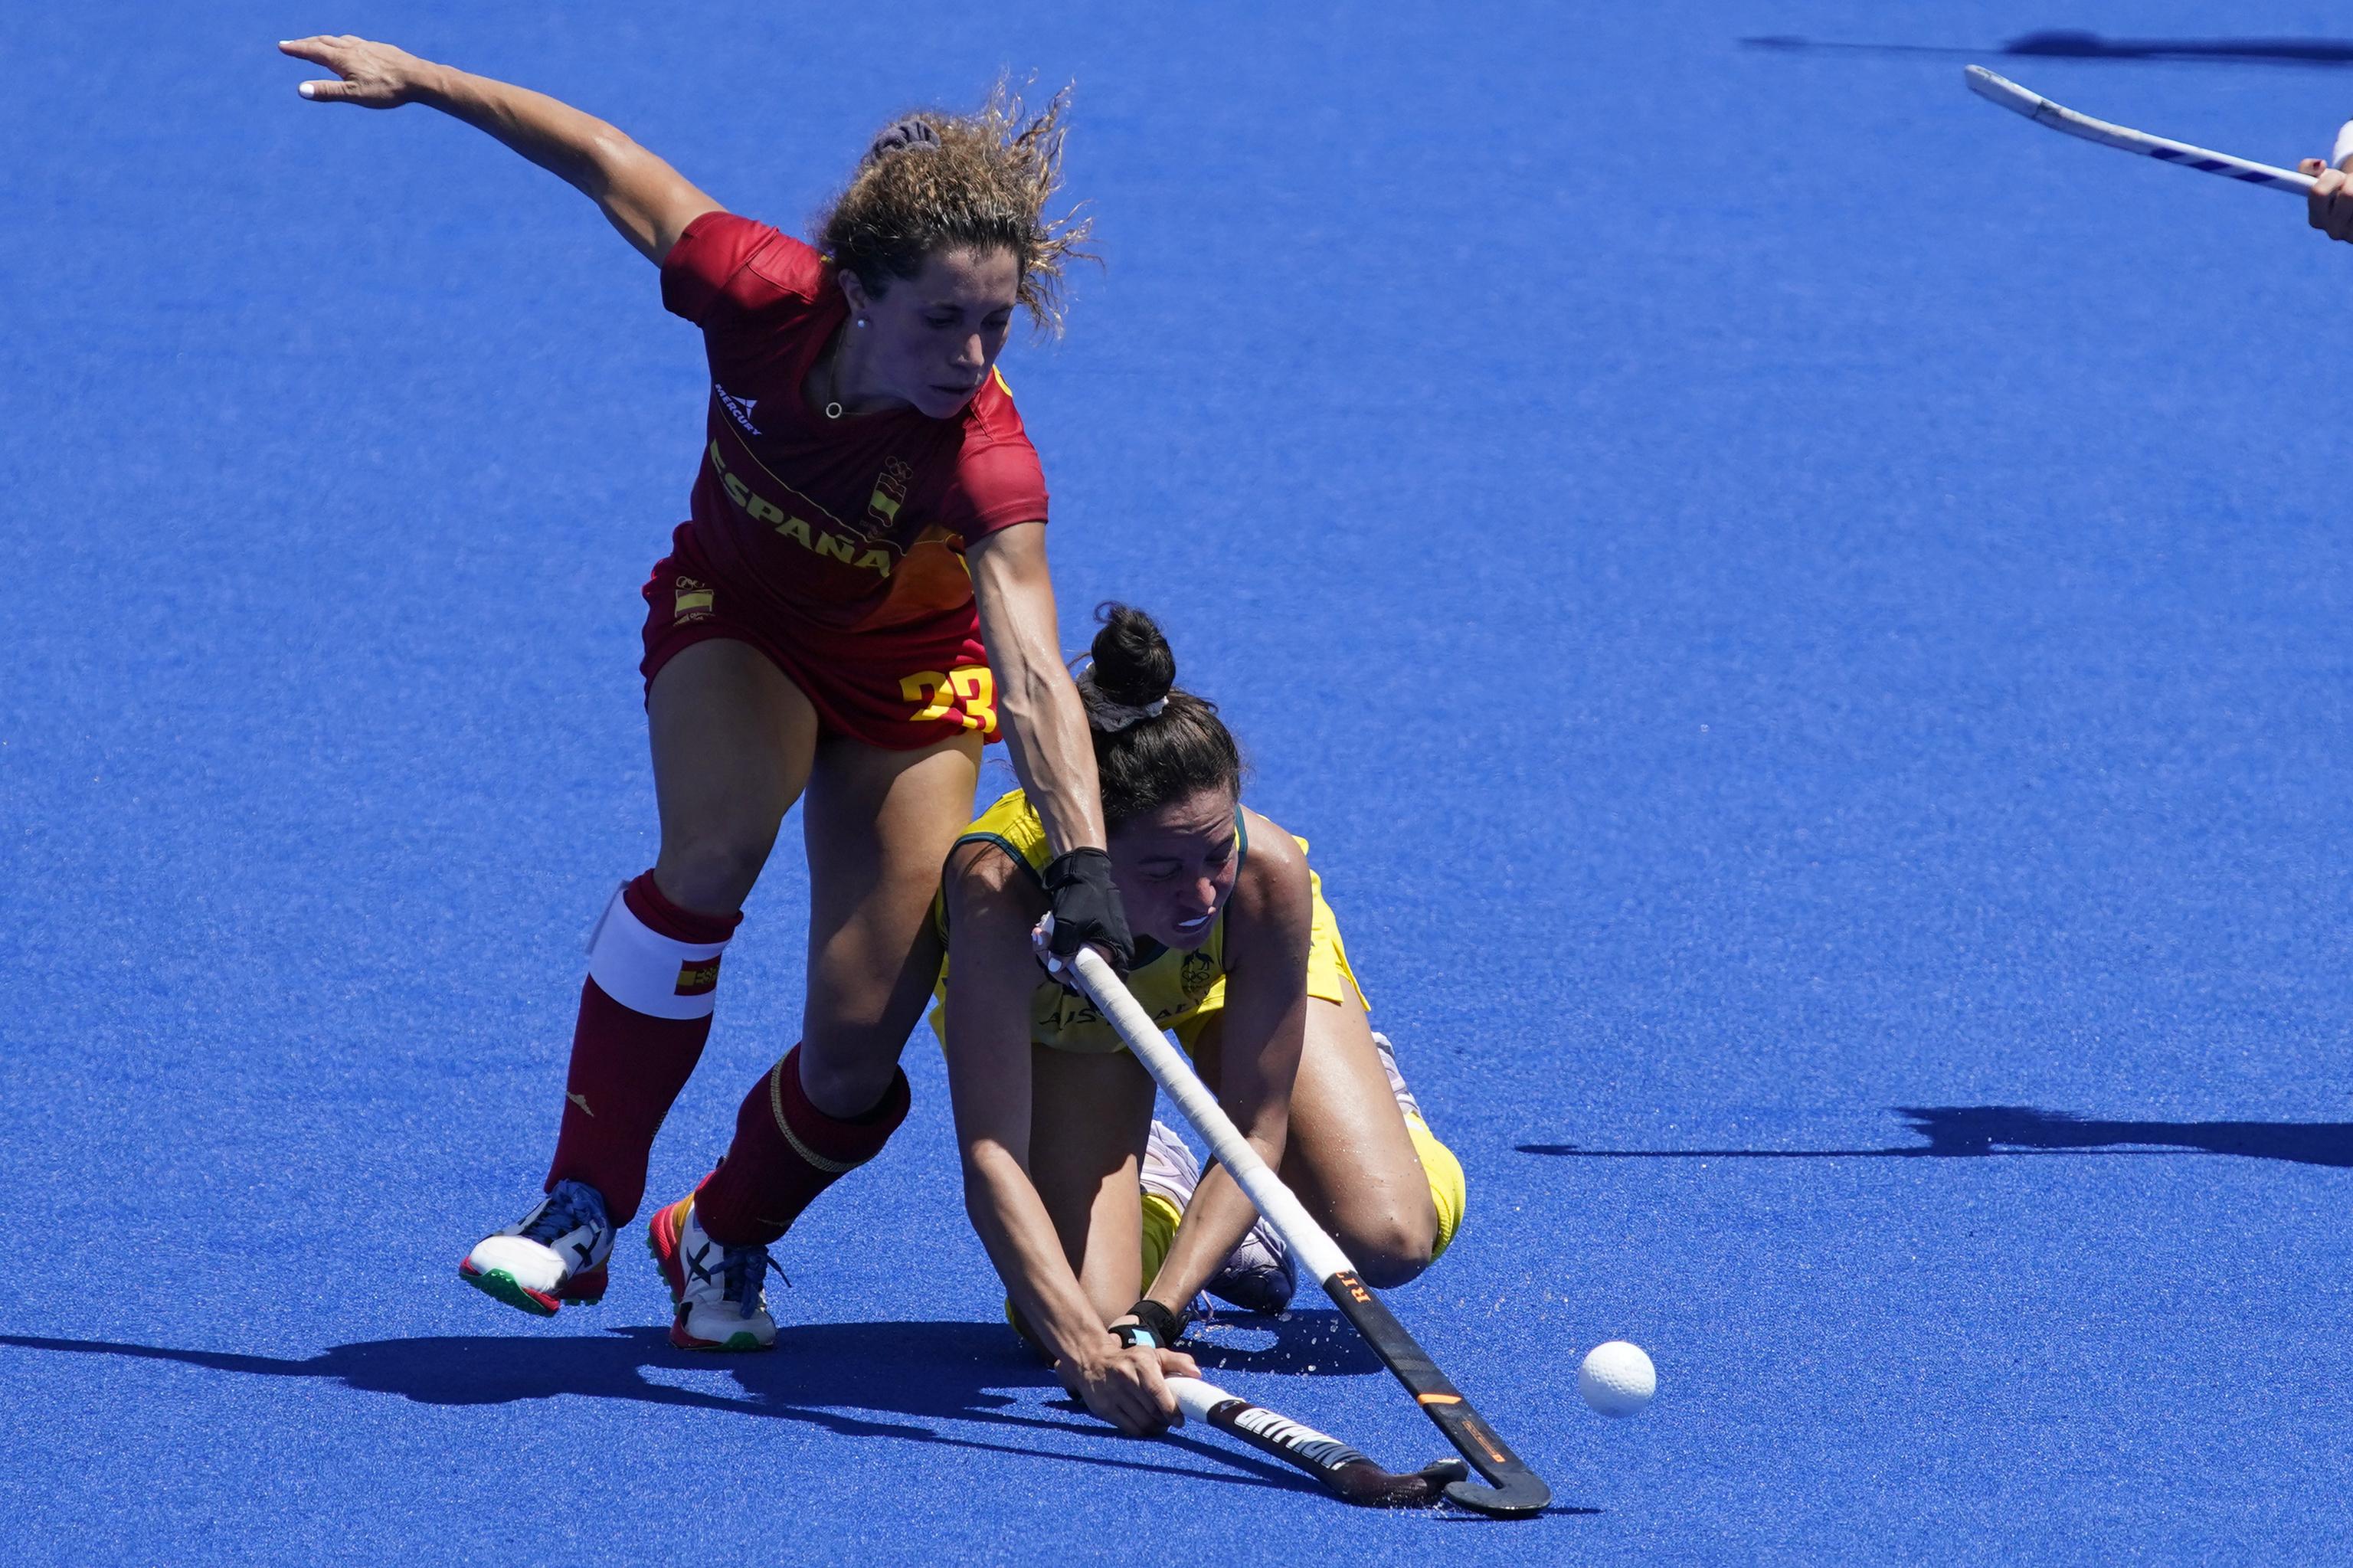 Georgina Oliva - hockey hierba - Juegos Olímpicos 2021 - Tokio 2020